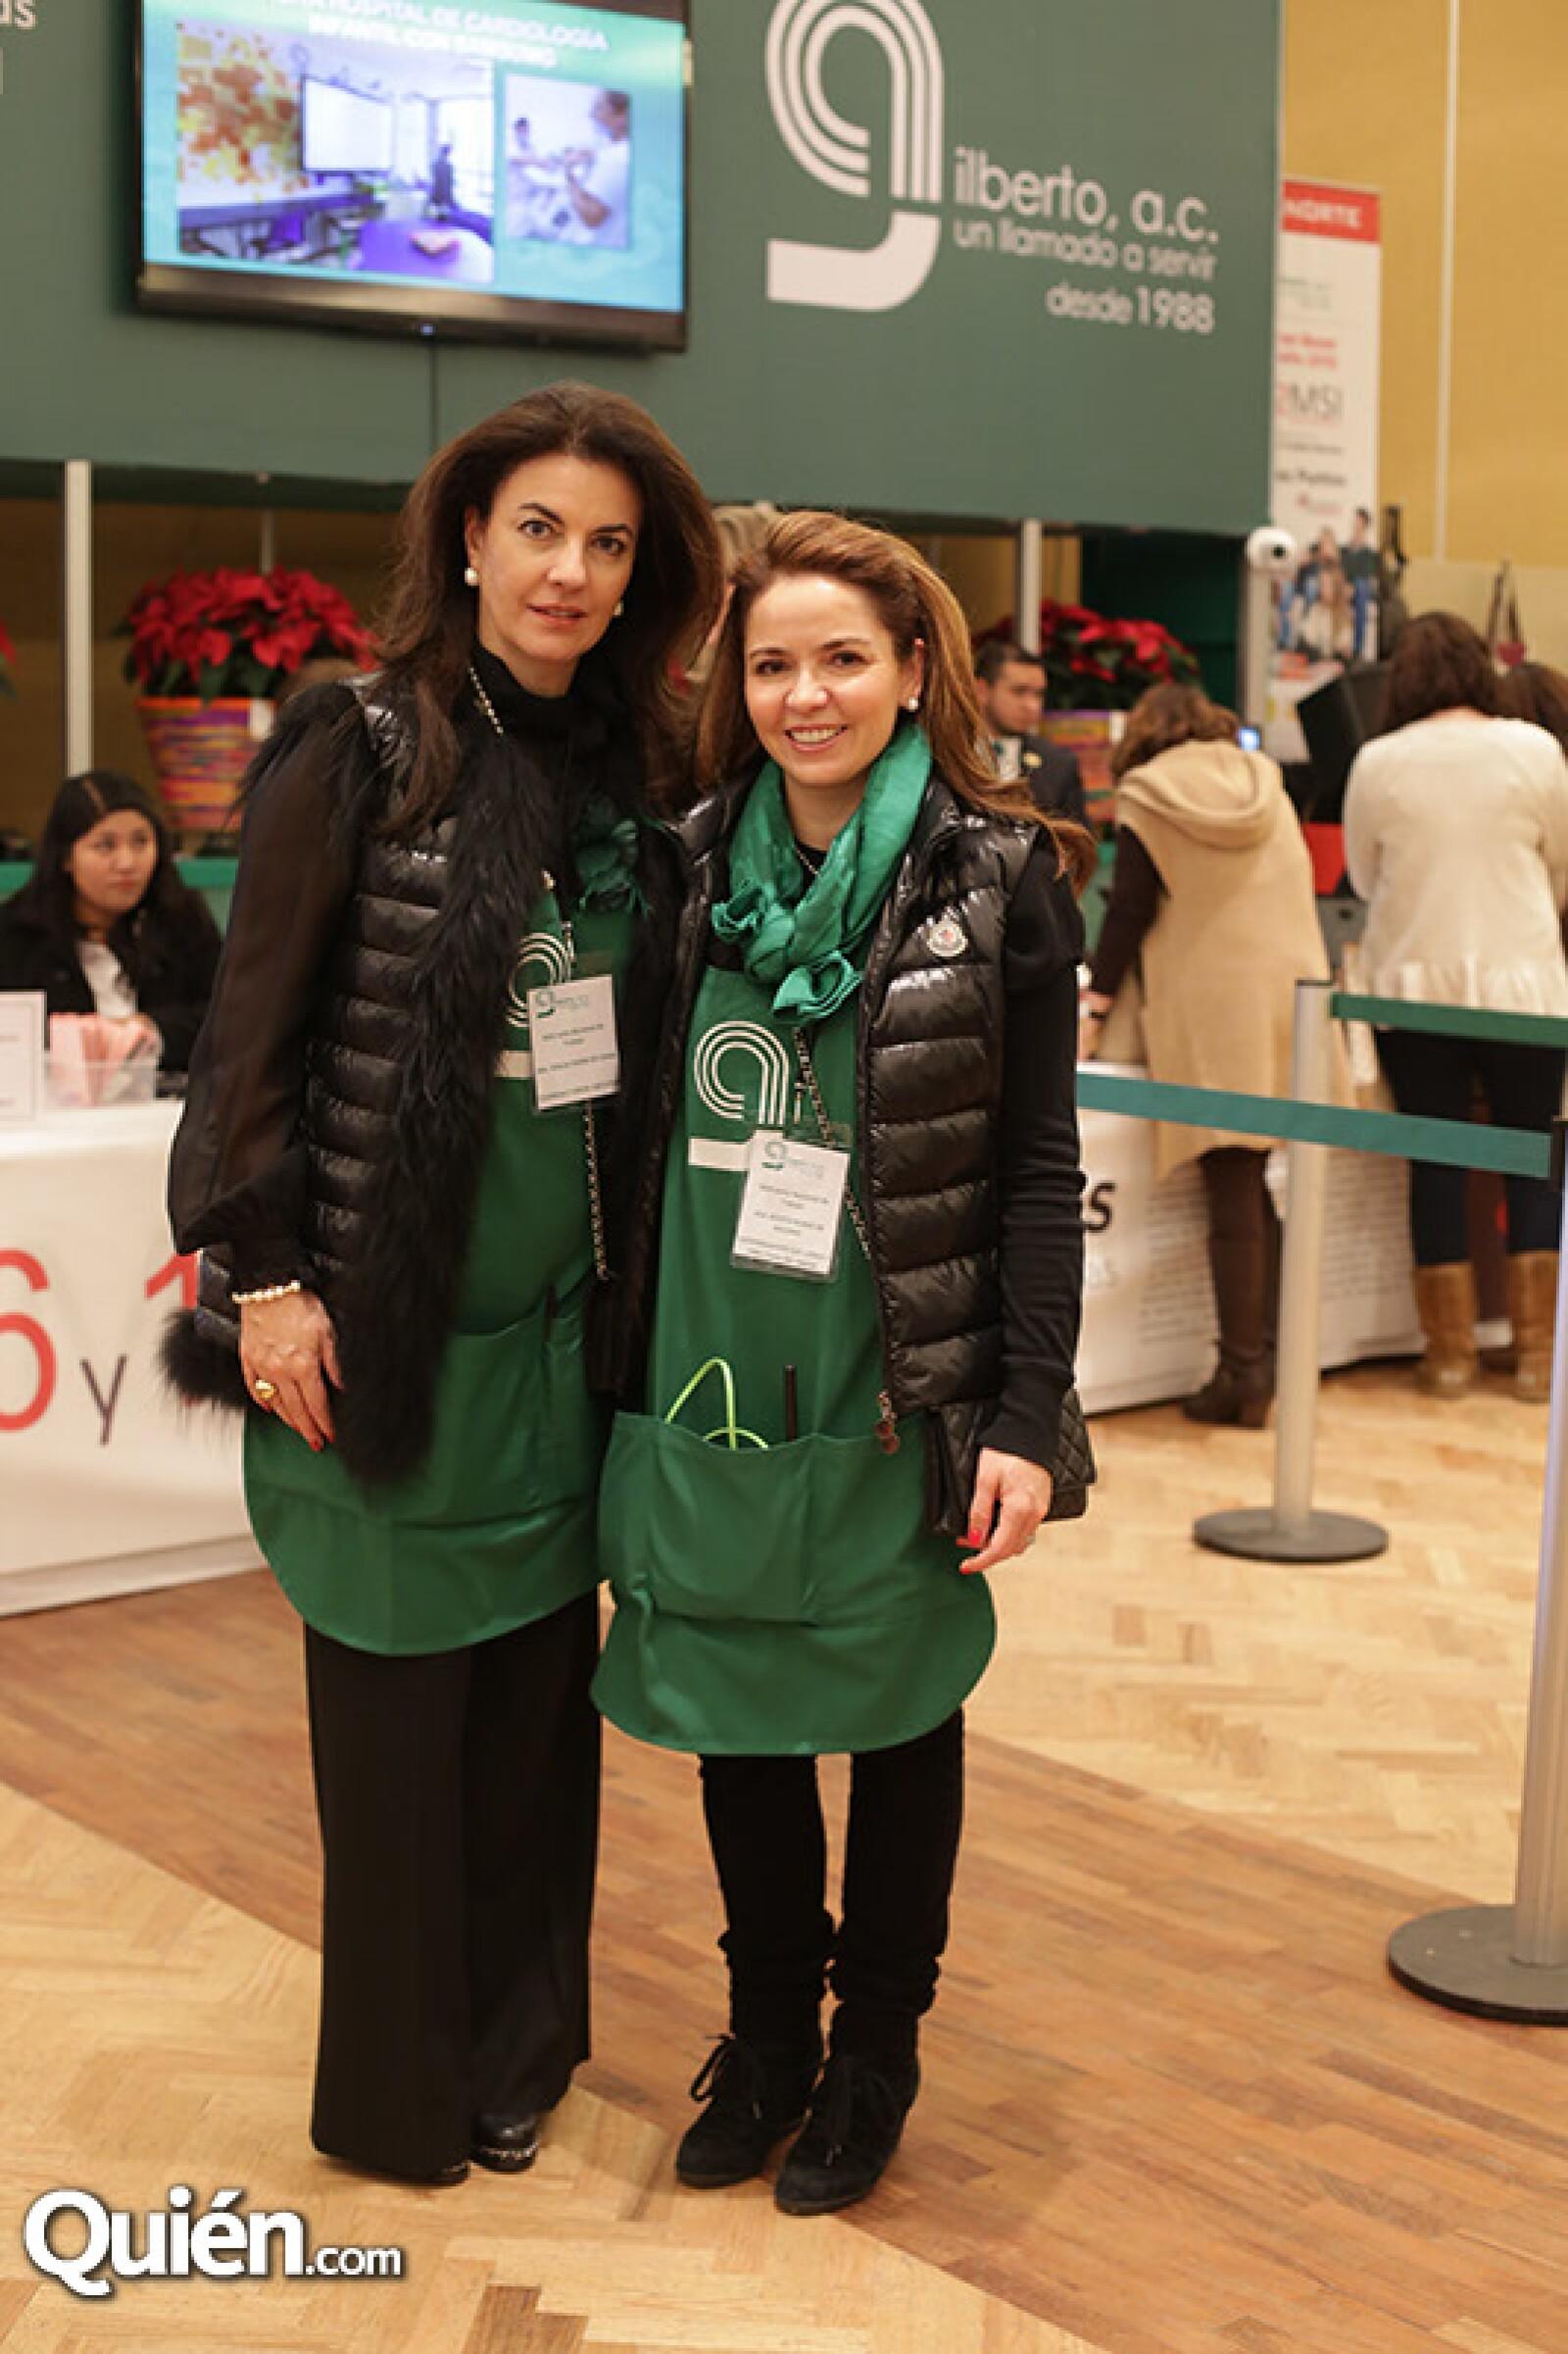 Teresa Cabal y Rosita Aguirre